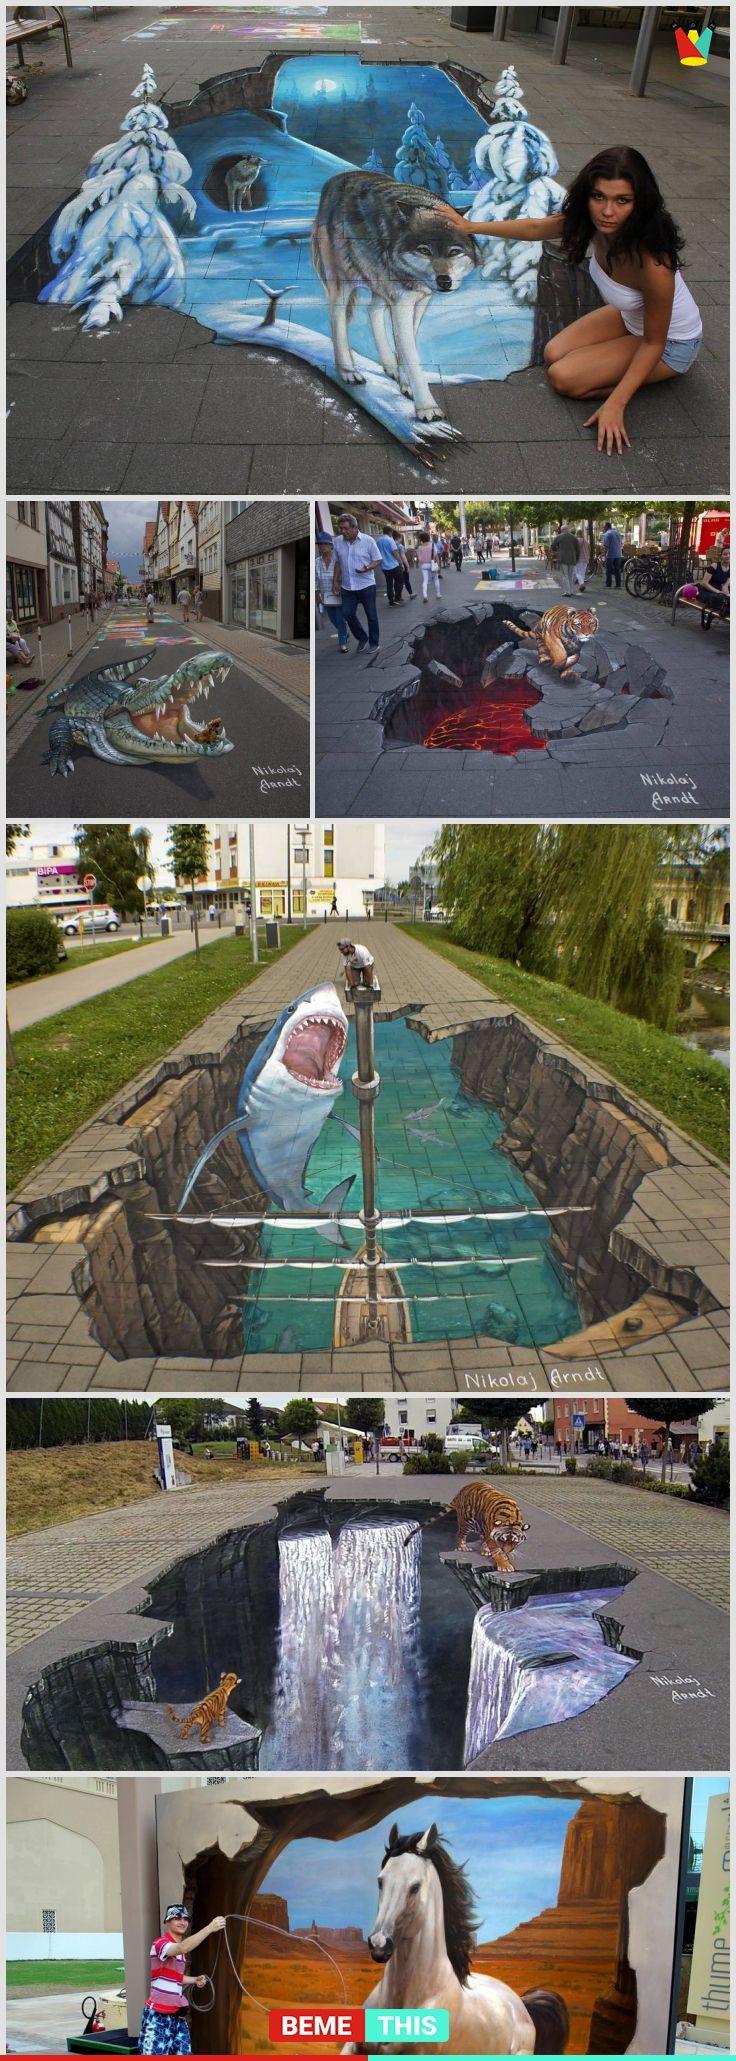 This Amazing Artist Creates Incredibly Realistic Looking 3D Art Work #streetart #3dart #nikolajarndt #bemethis